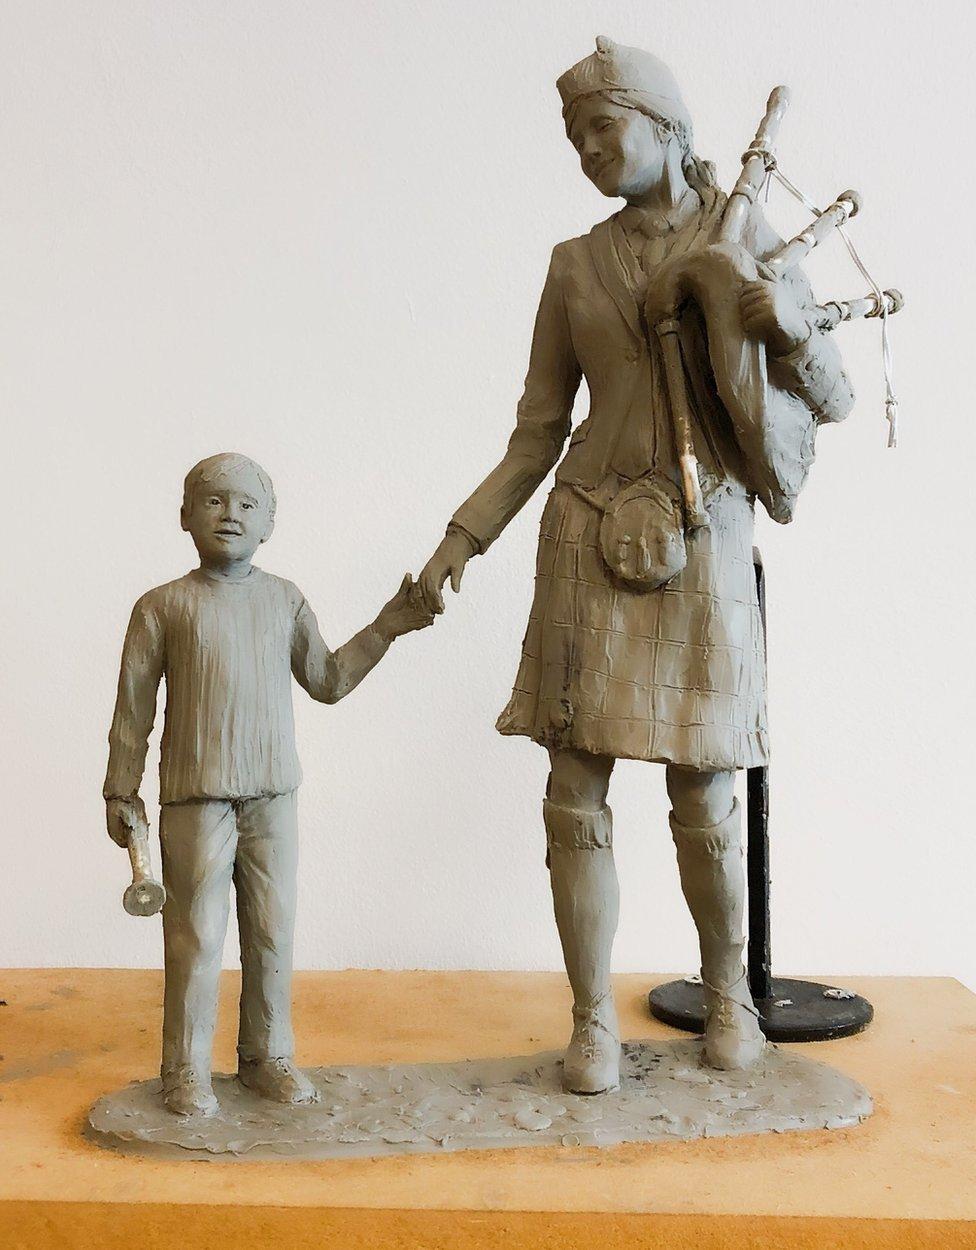 Design of new sculpture